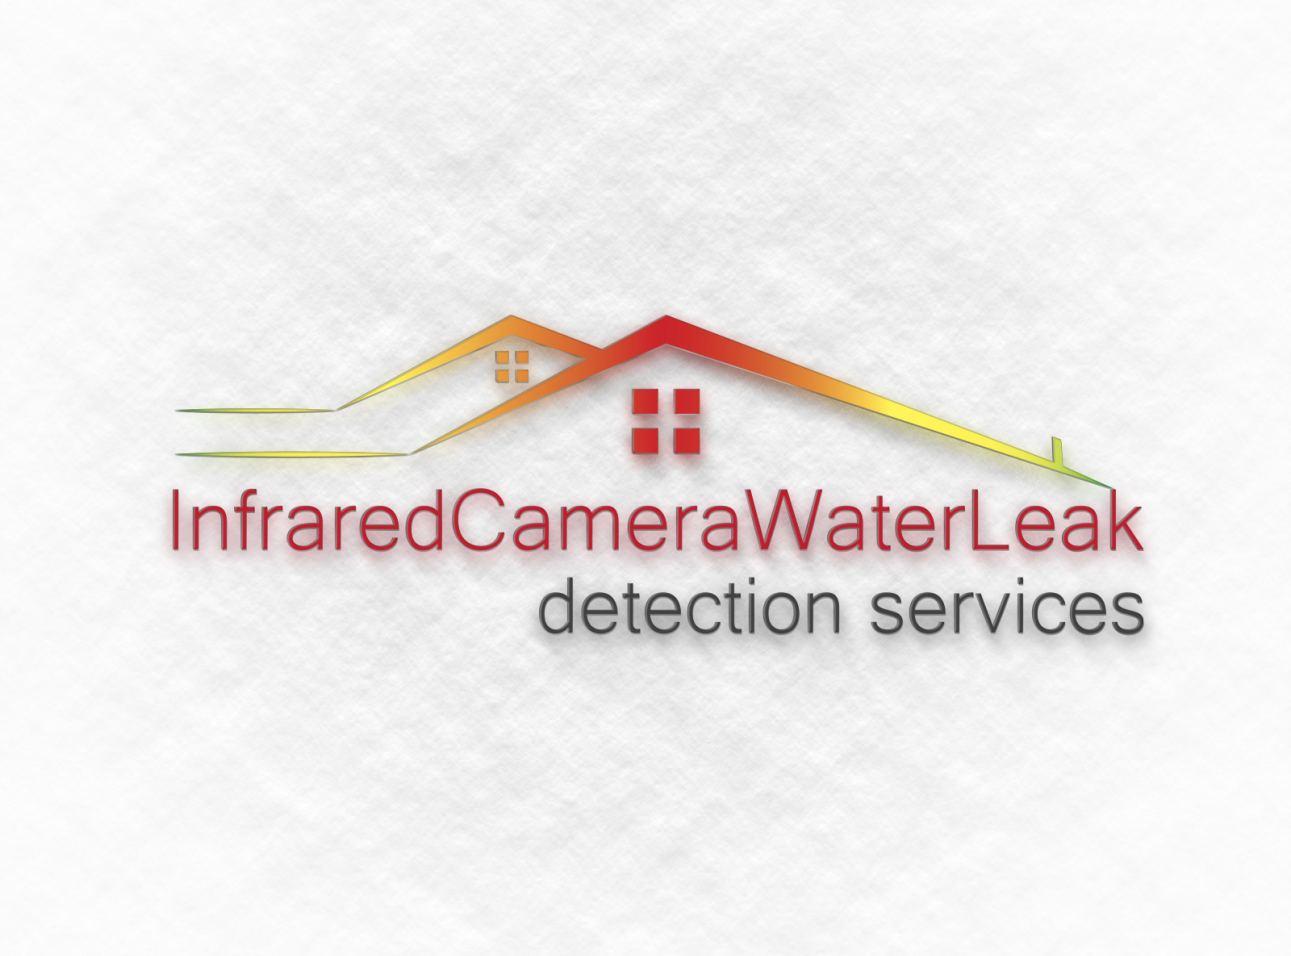 4747_InfraredCameraWaterLeakDetectionServices_mock